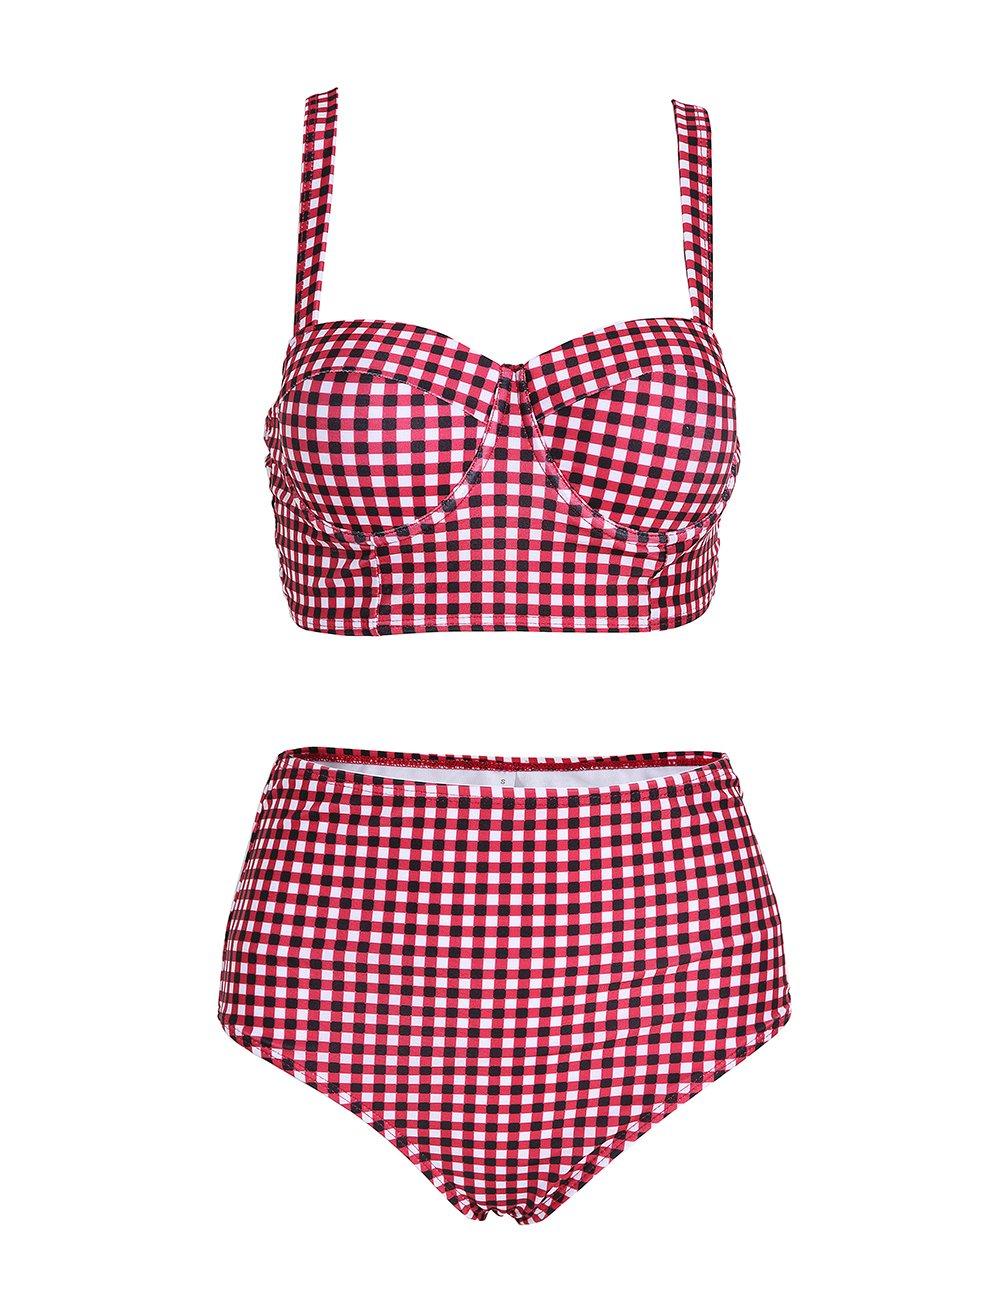 NAFLEAP Women Retro High Waisted Push up Bikini with Polka Dot, Red, Medium